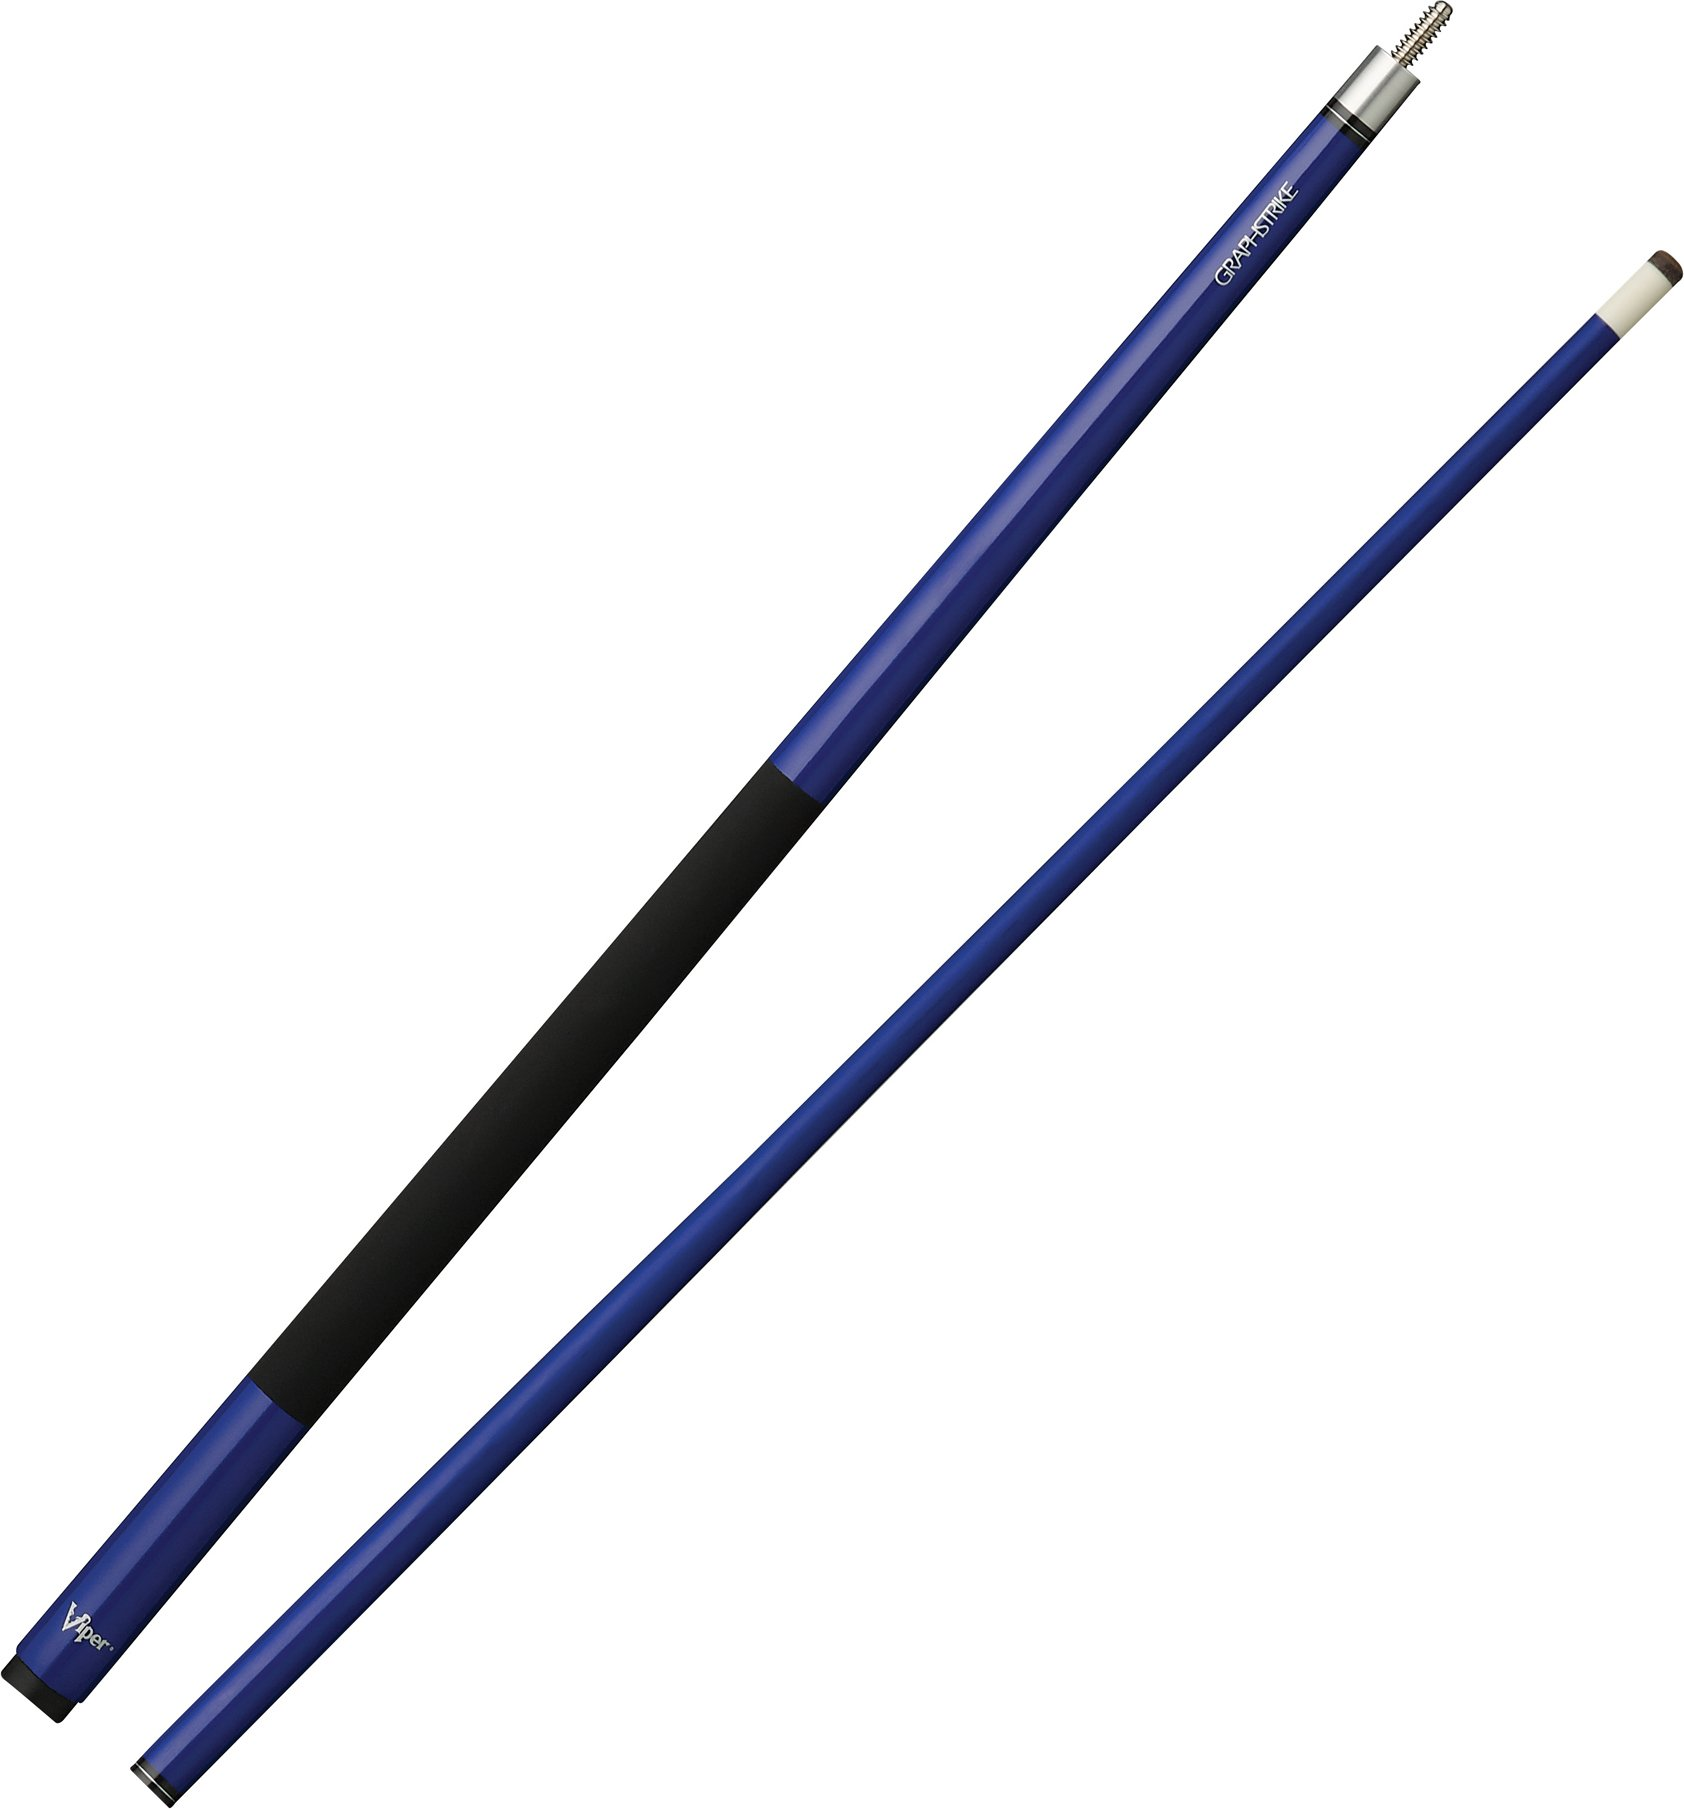 Viper Graphstrike 58'' 2-Piece Fiberglass Graphite Composite Billiard/Pool Cue, Blue